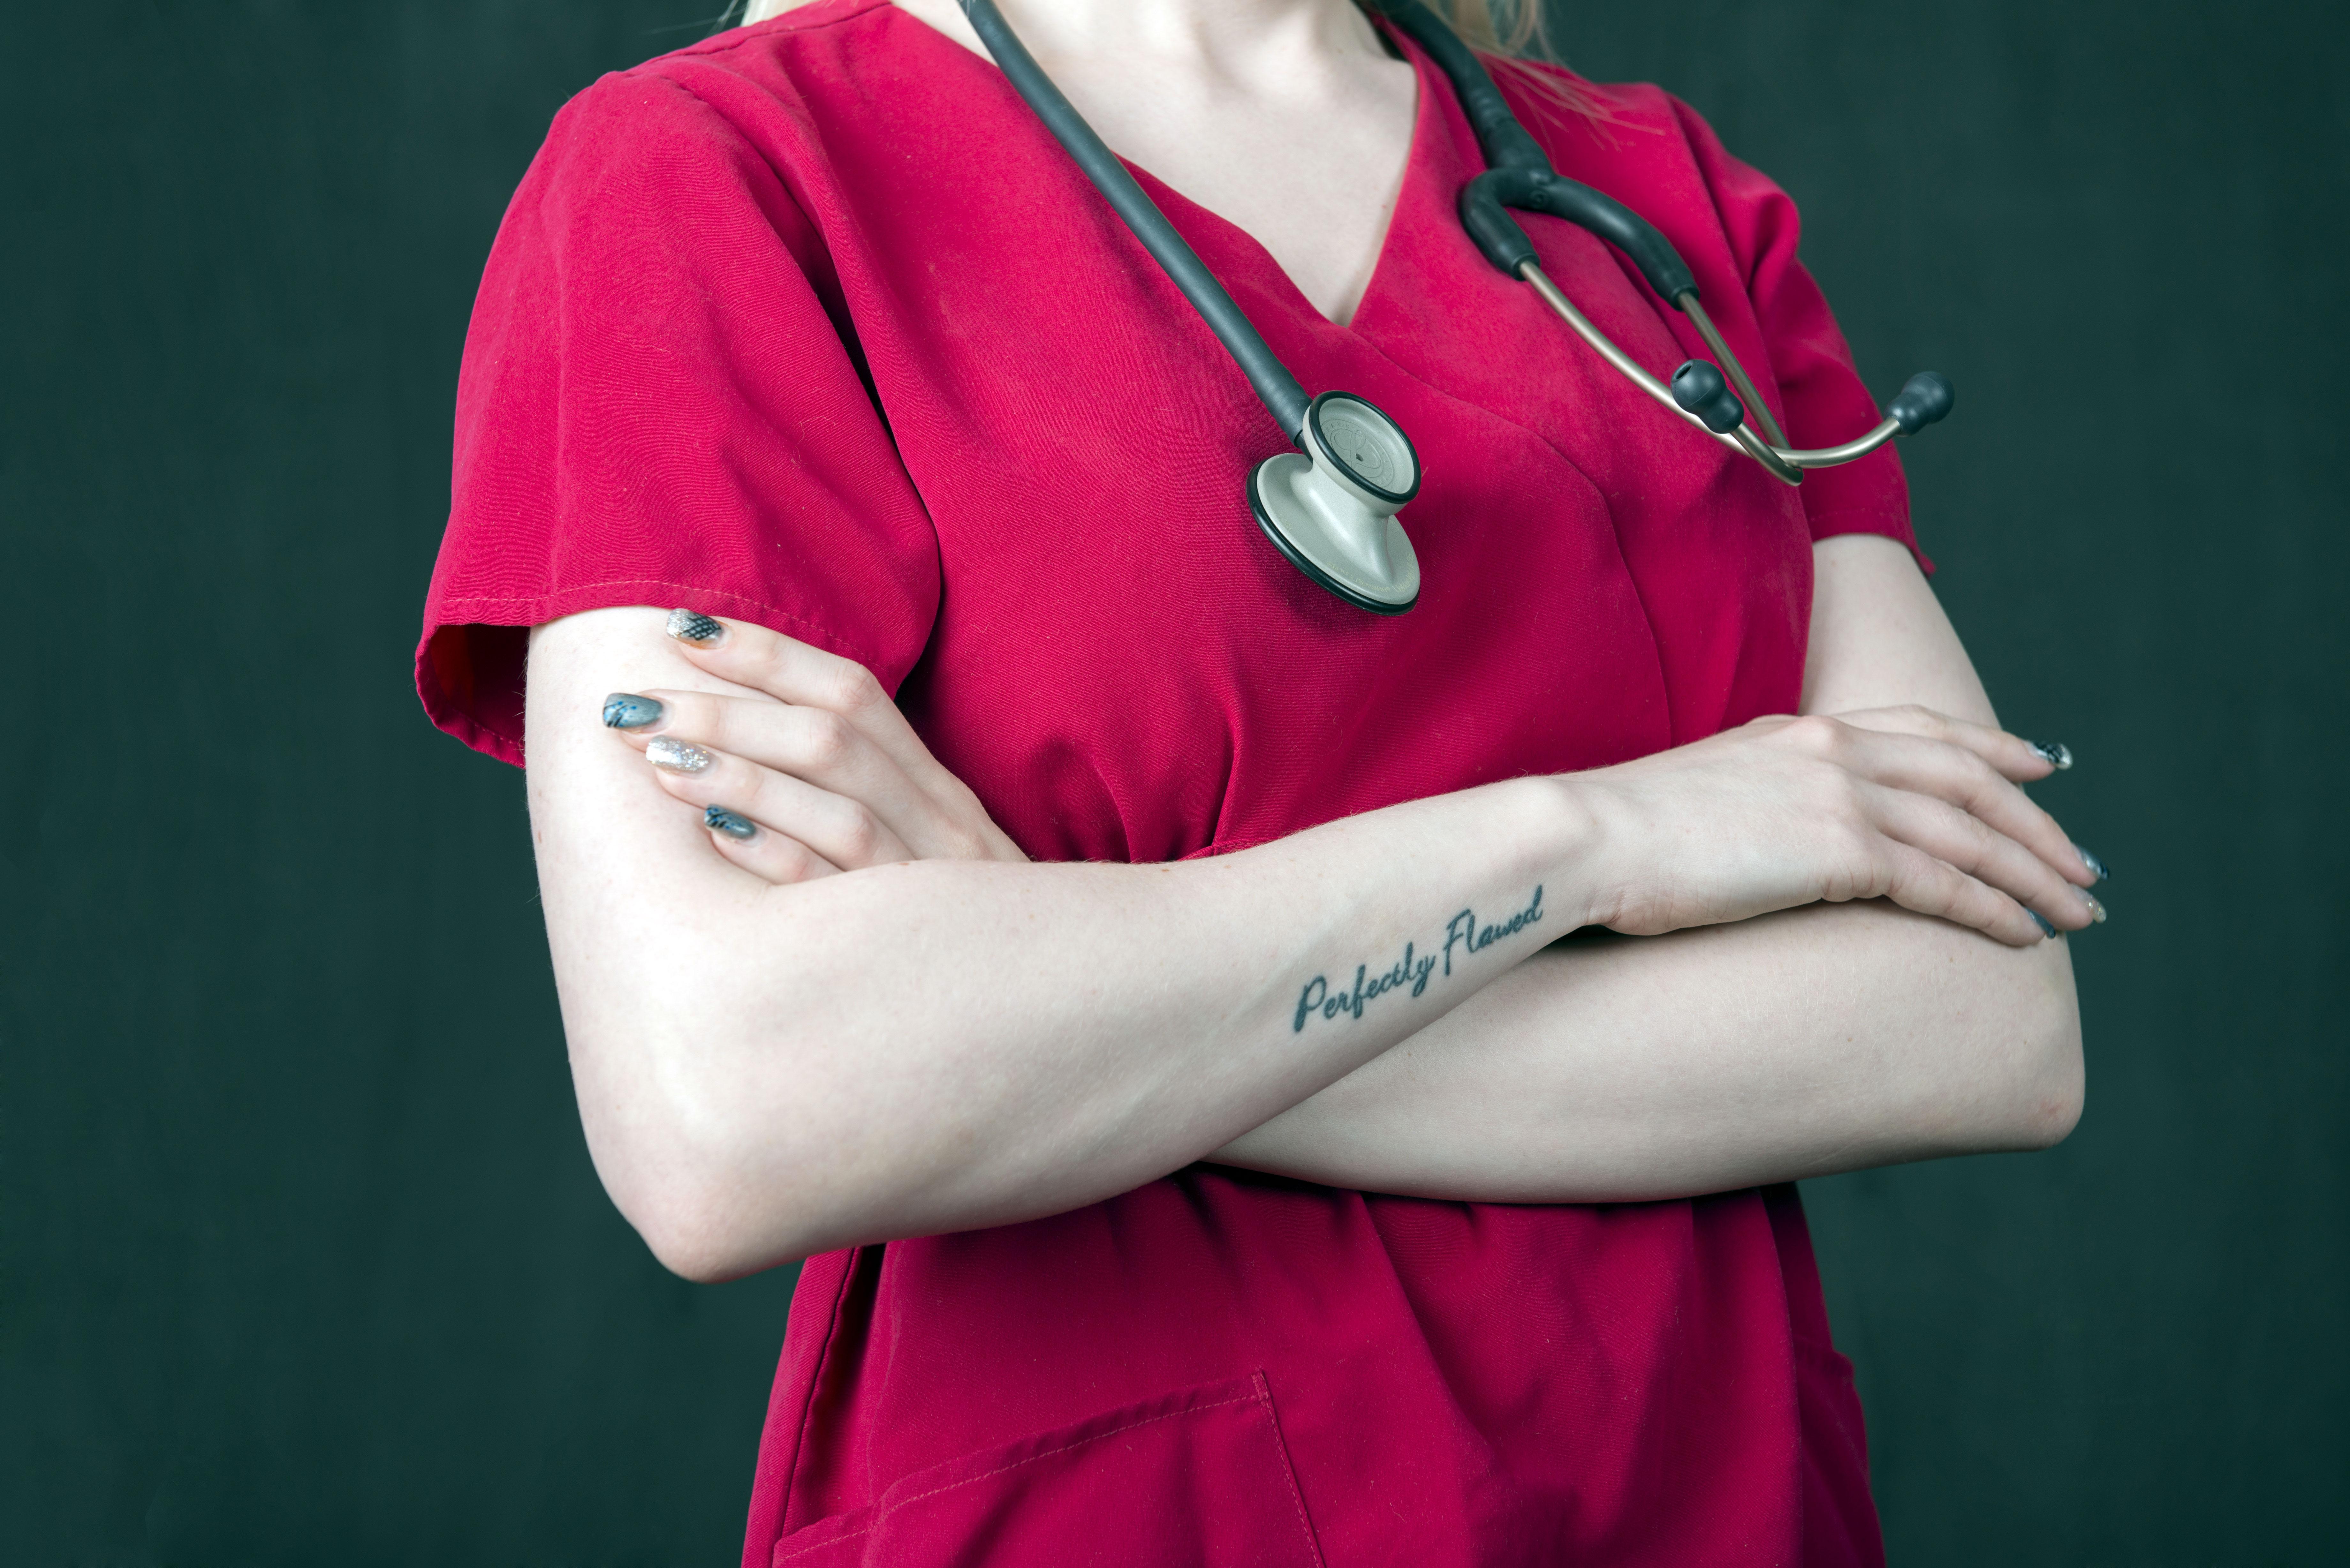 Careplans blog nurses tattoos piercings unprofessional or self nurses tattoos piercings unprofessional or self expression buycottarizona Choice Image